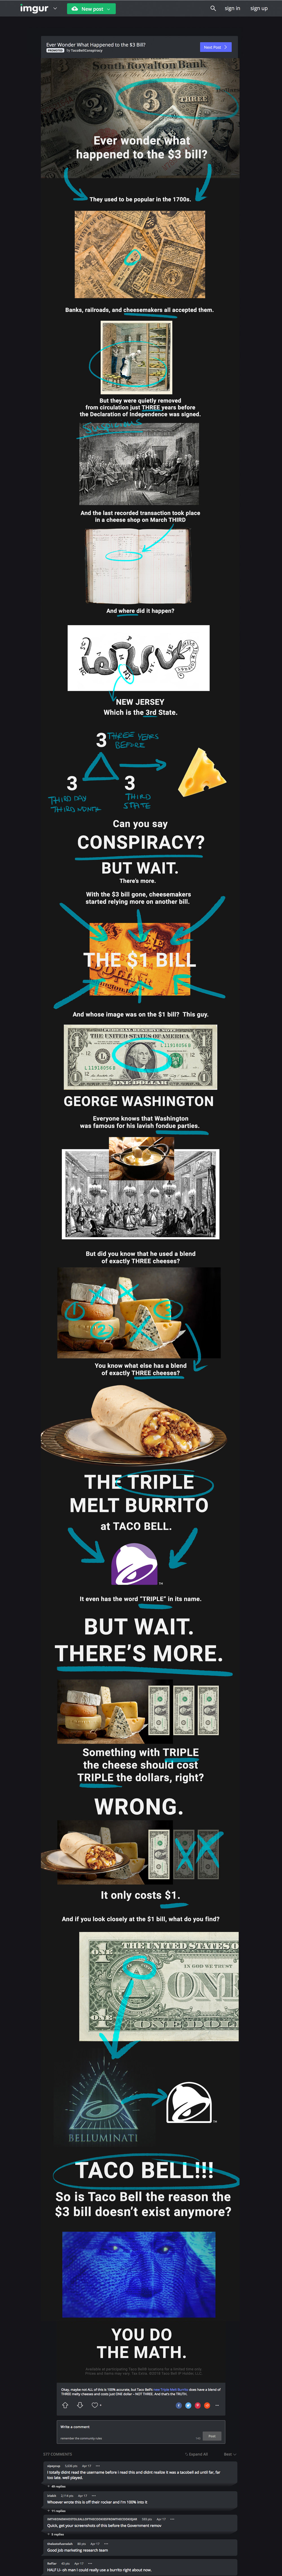 Taco+Bell+IMGURArtboard+2.jpg